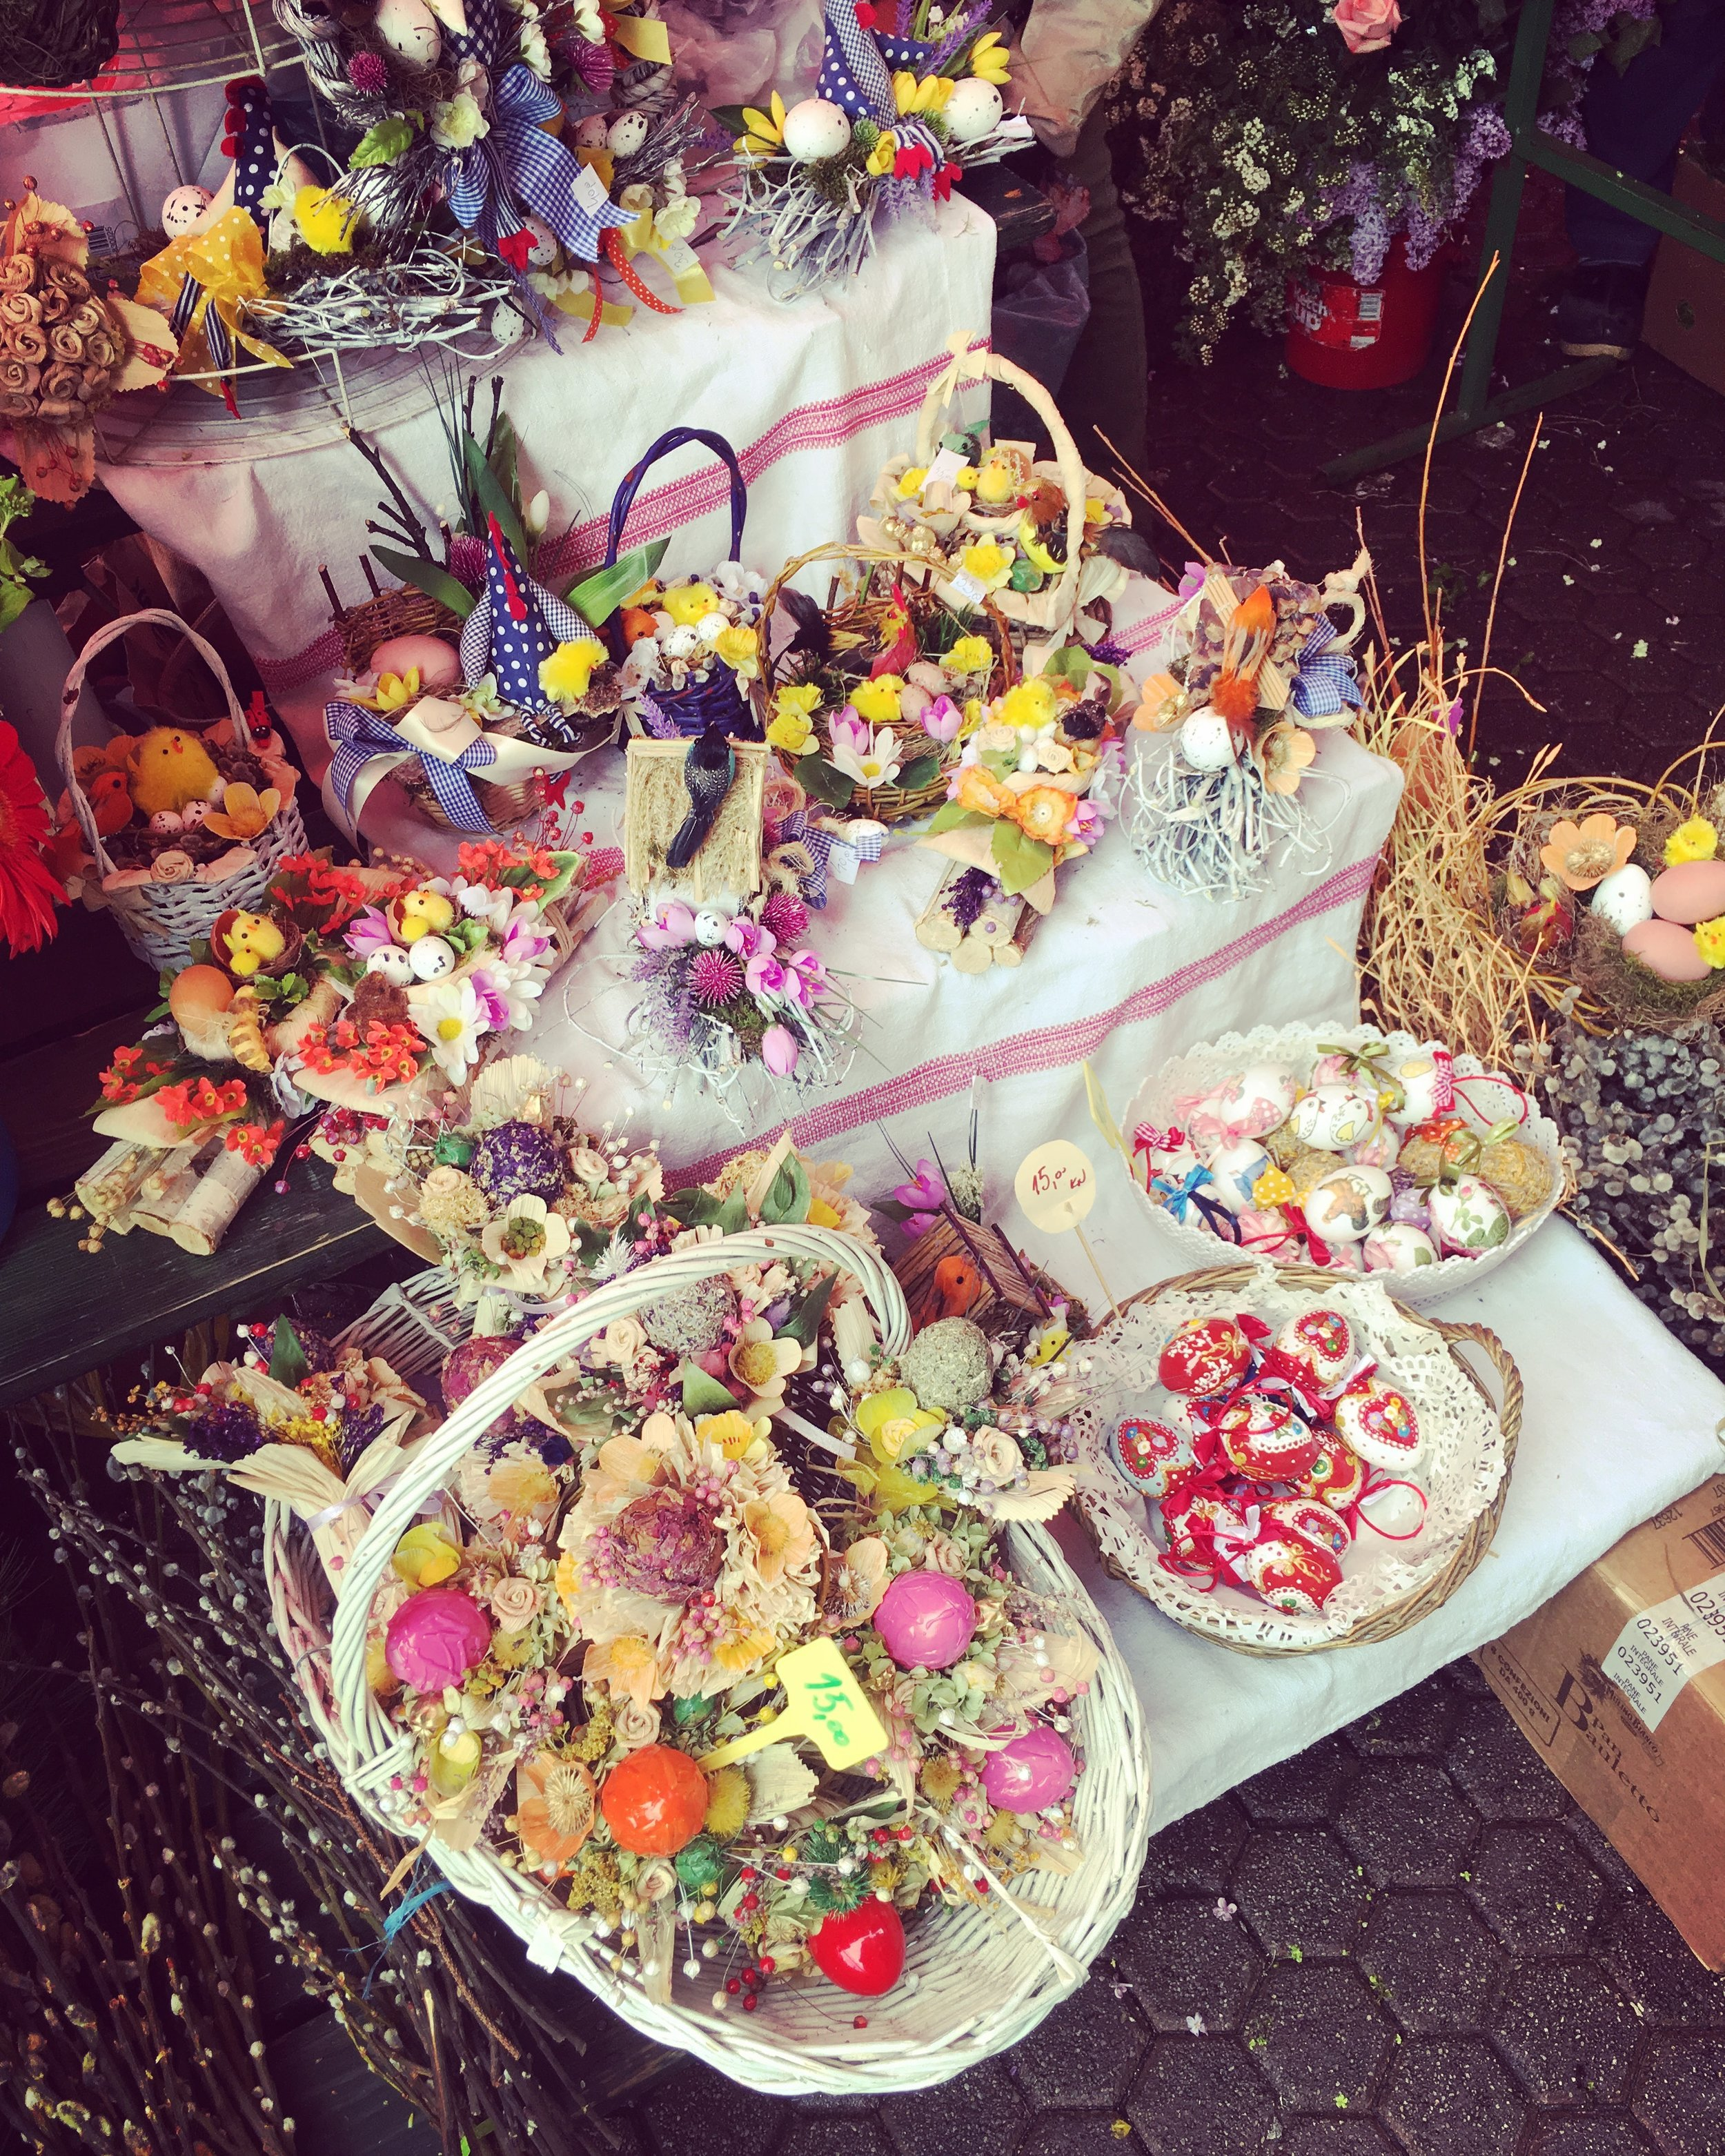 Zagreb's flower markets during Easter